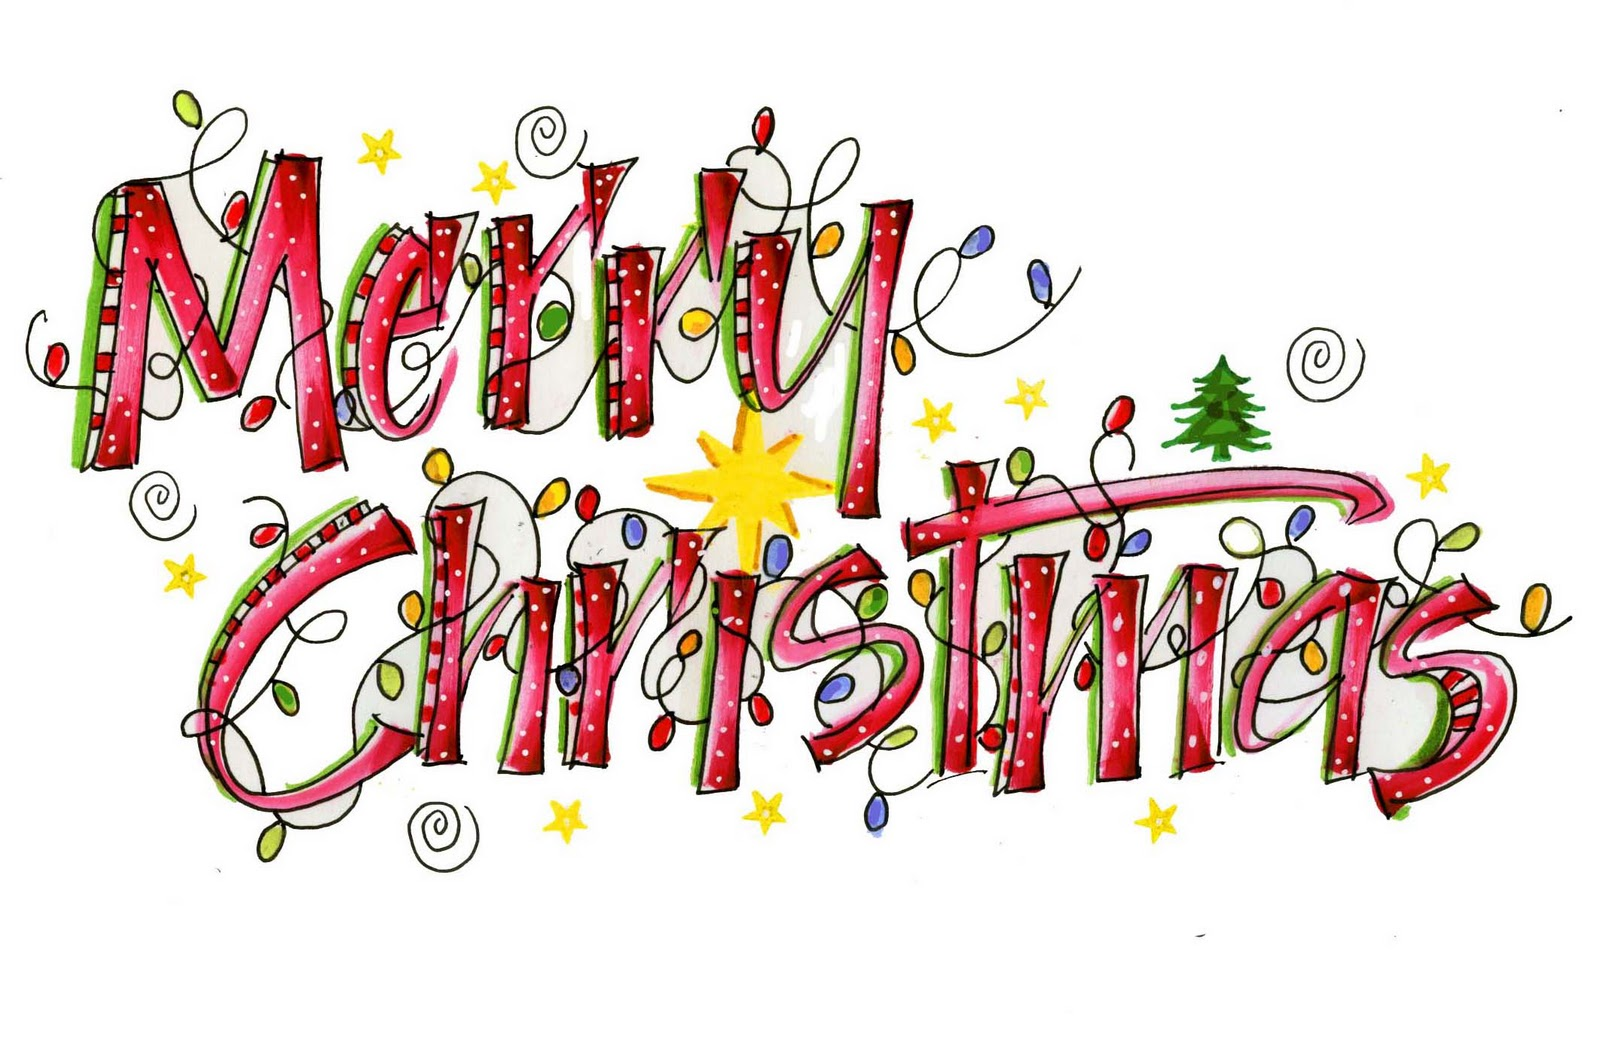 Merry Christmas Everyone Steve Tierney S-Merry Christmas Everyone Steve Tierney S Blog-9